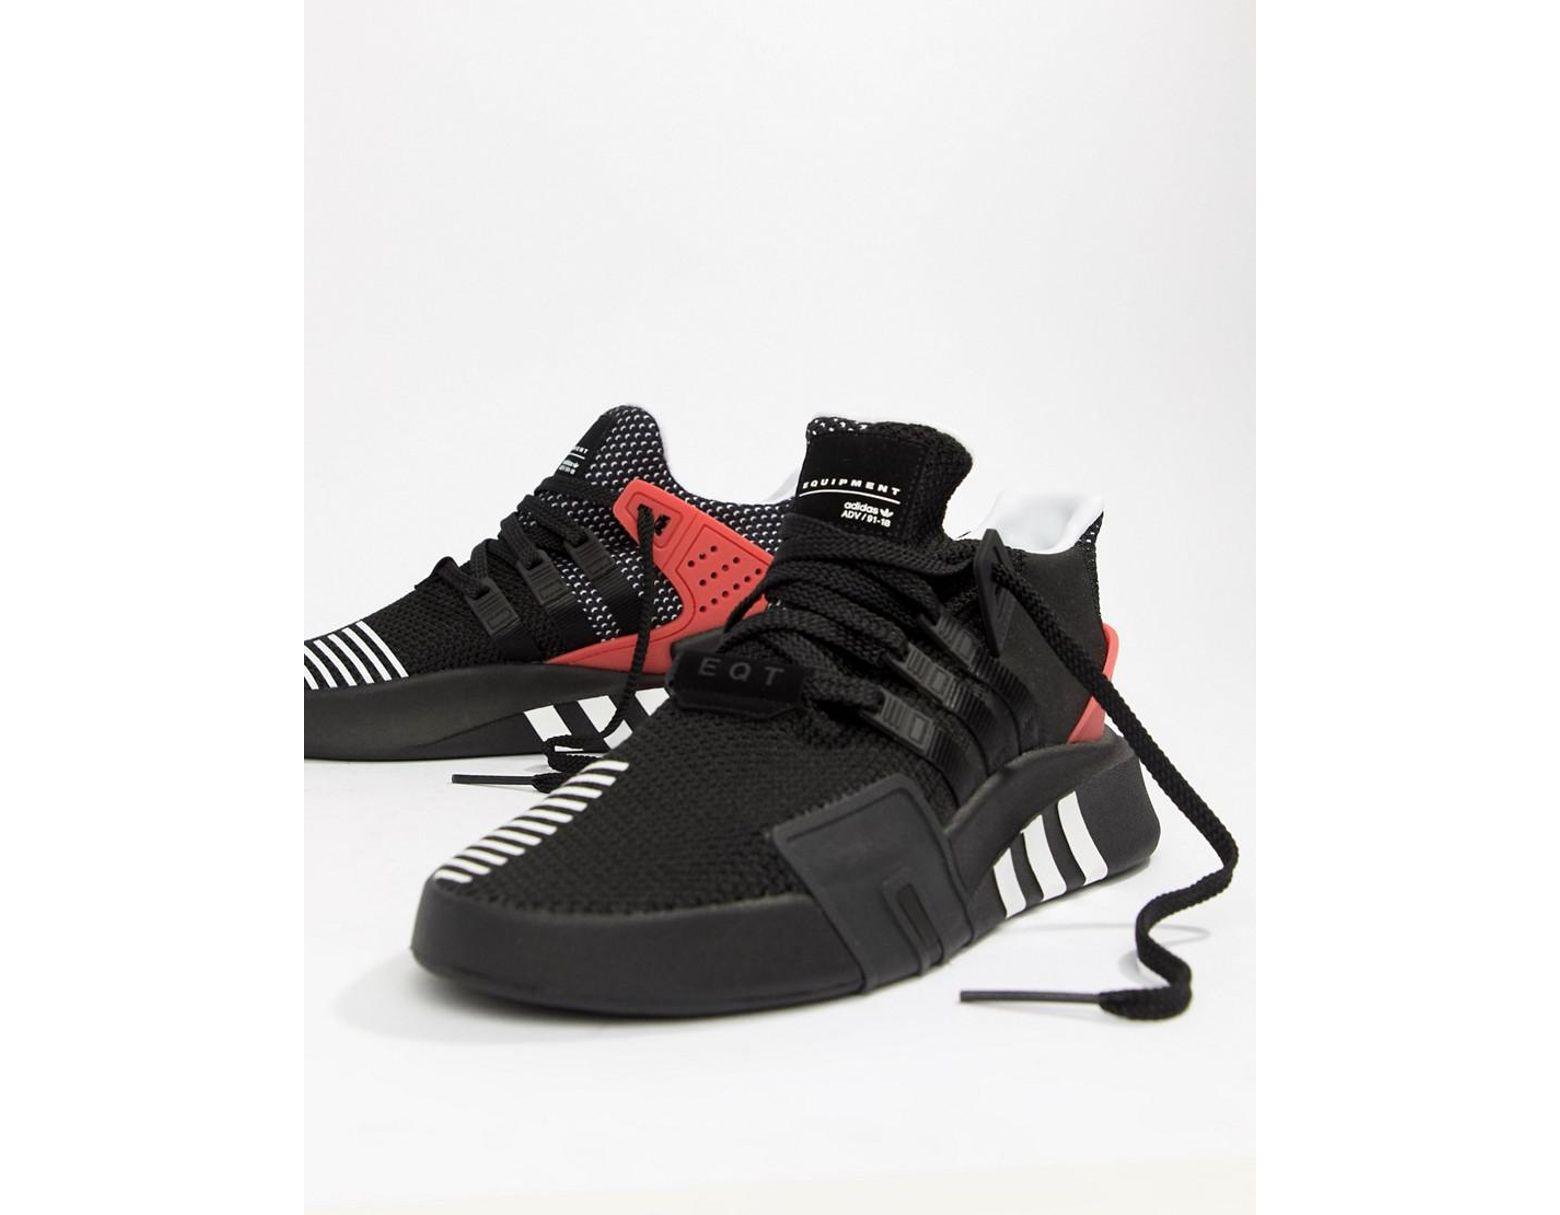 a3096405bca adidas Originals Eqt Bask Adv Sneakers In Black Aq1013 in Black for Men -  Lyst